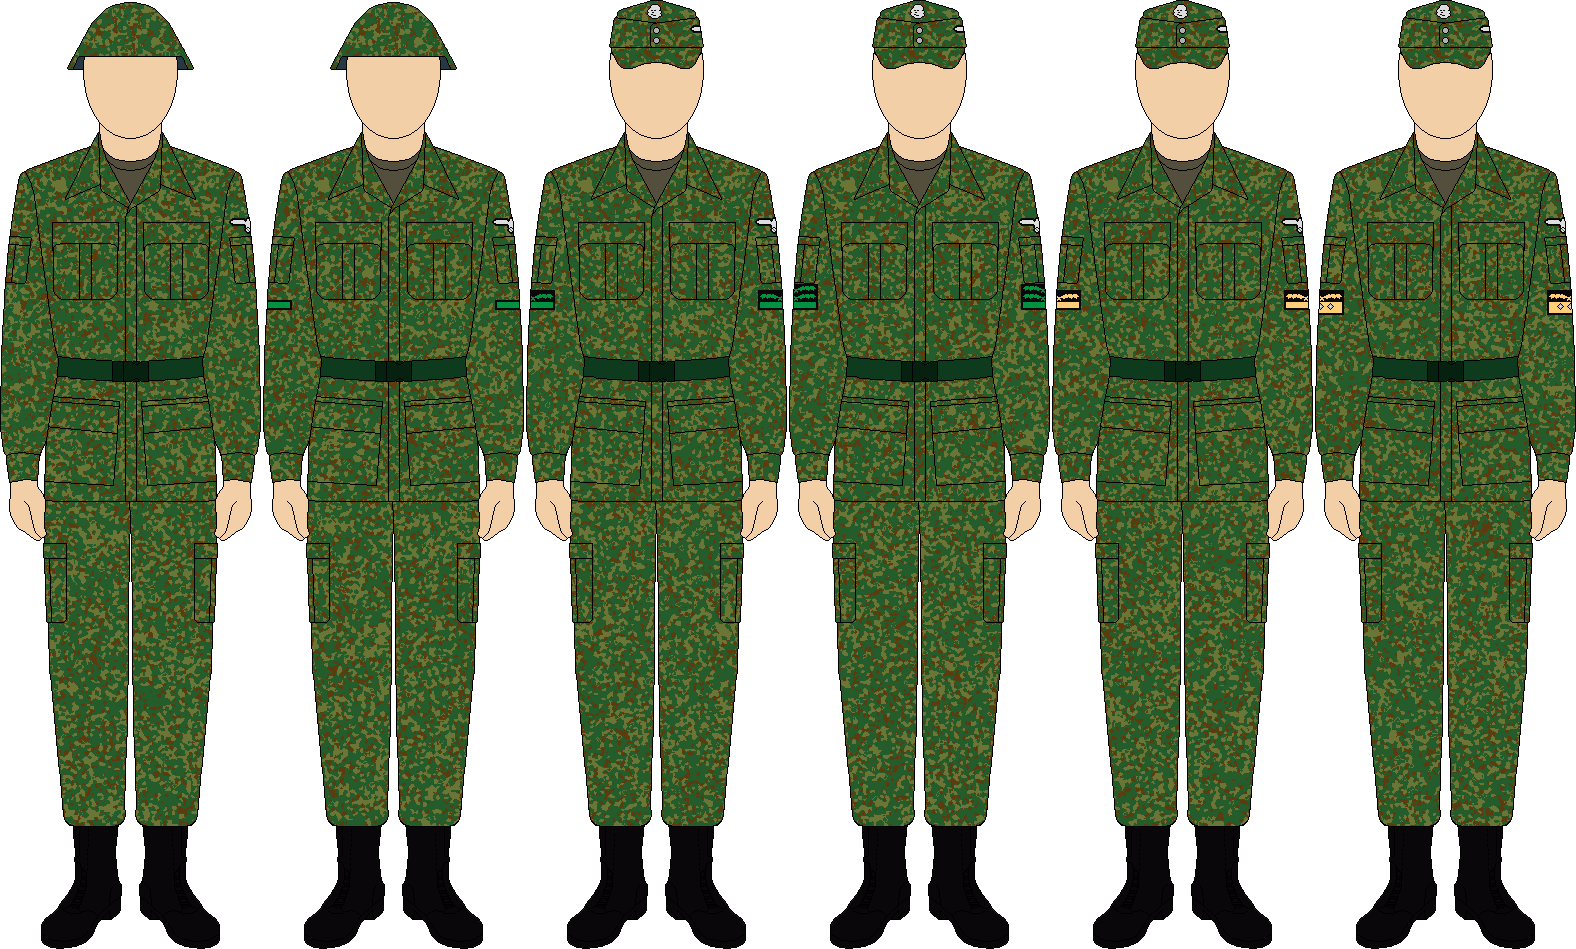 ss vs Wehrmacht Uniform Camouflage Uniform Waffen ss